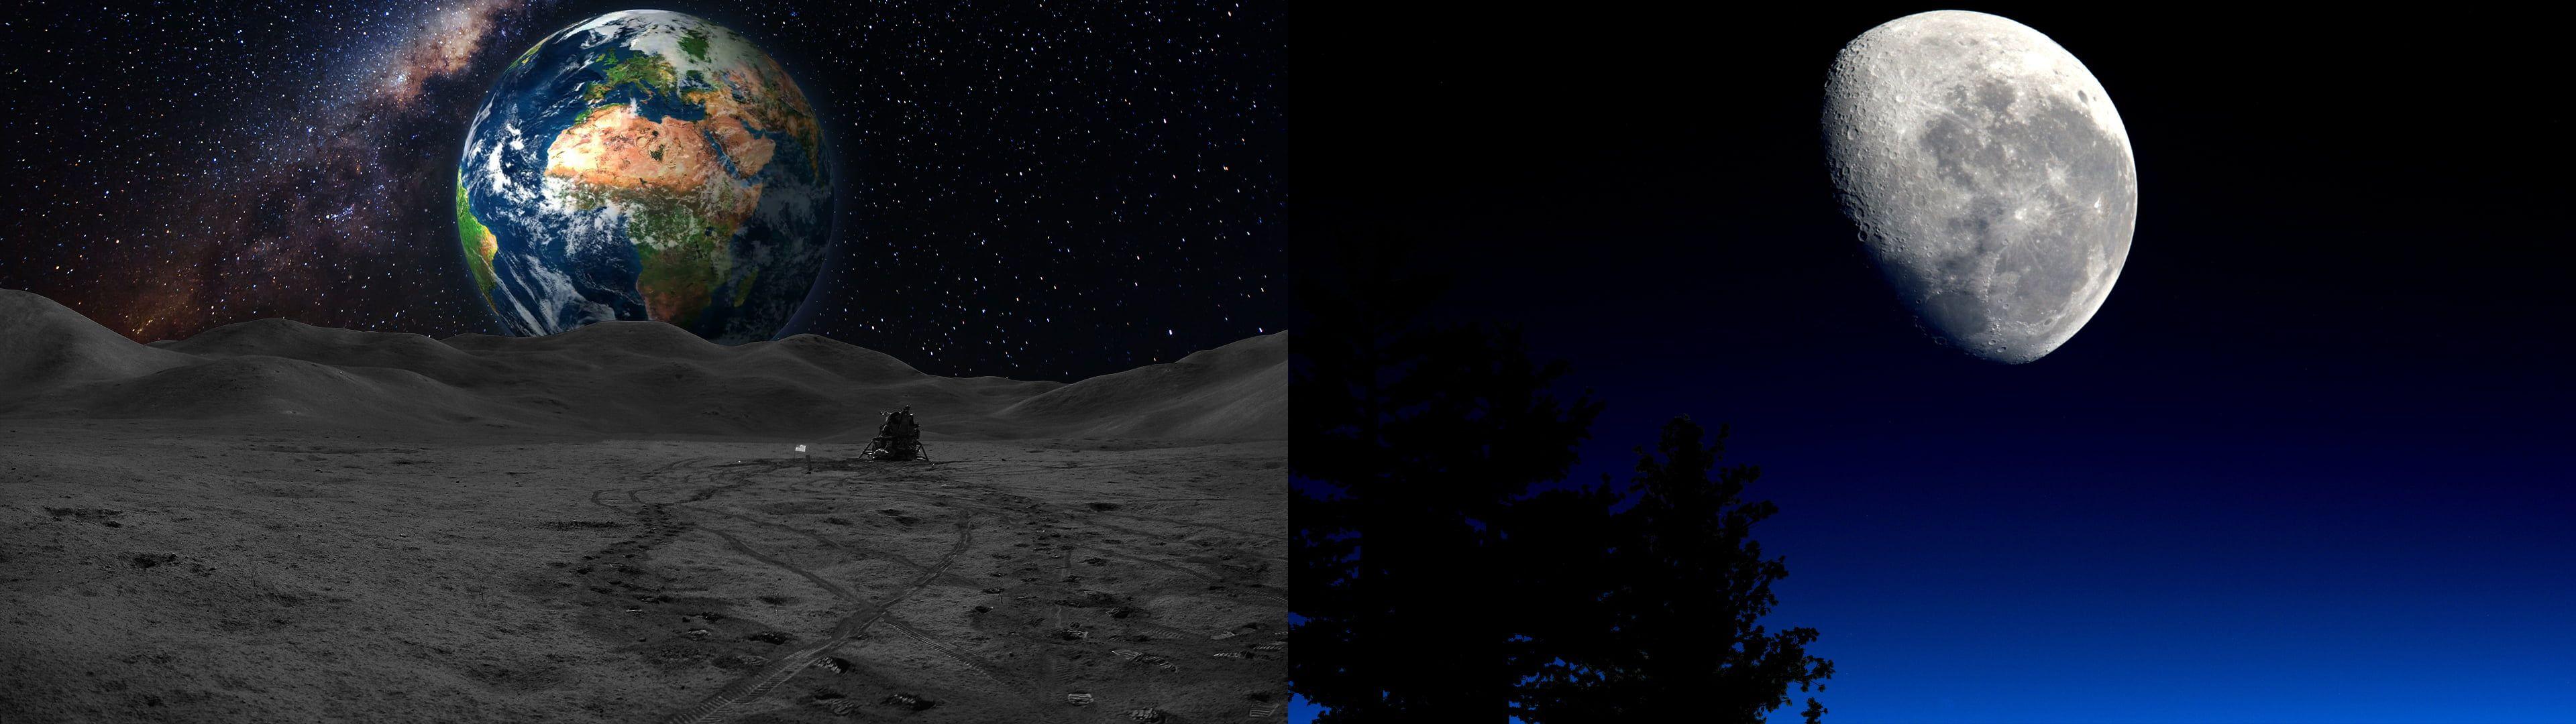 Dual Monitors Moon Earth Space 4k Wallpaper Hdwallpaper Desktop Wallpaper Astronomy Earth From Space